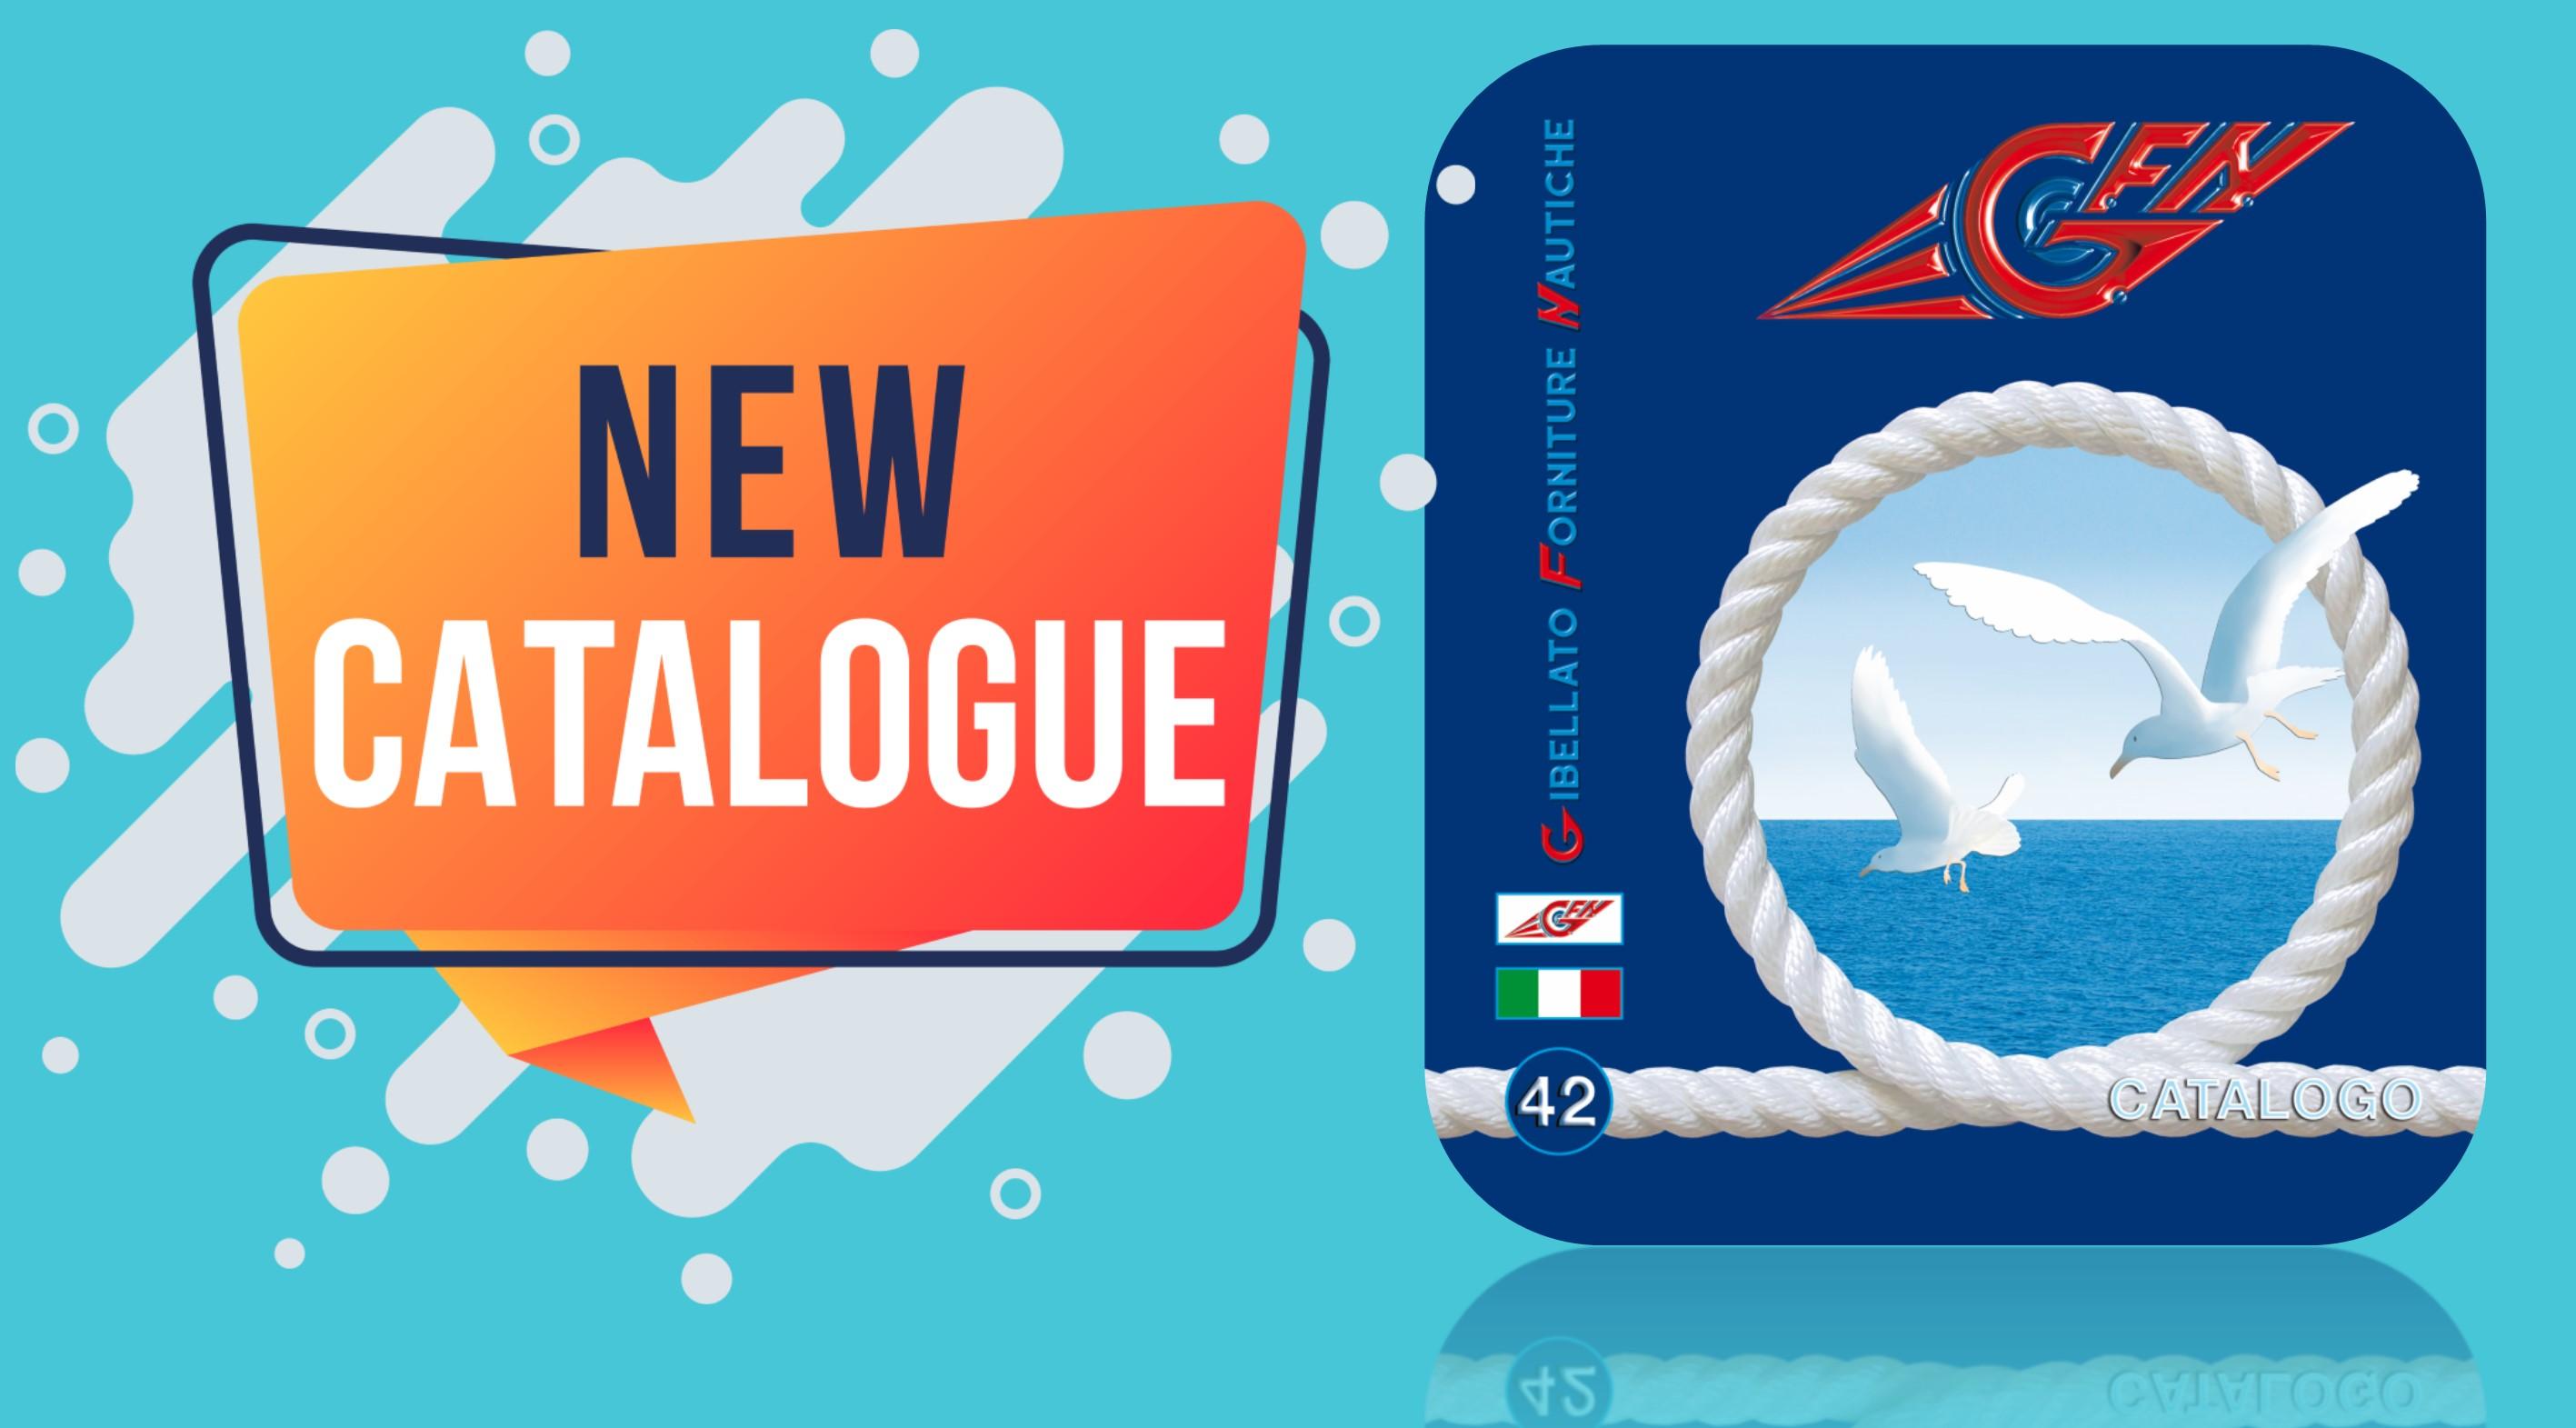 New Edition Gfn Catalogue 42 English Version G F N Gibellato